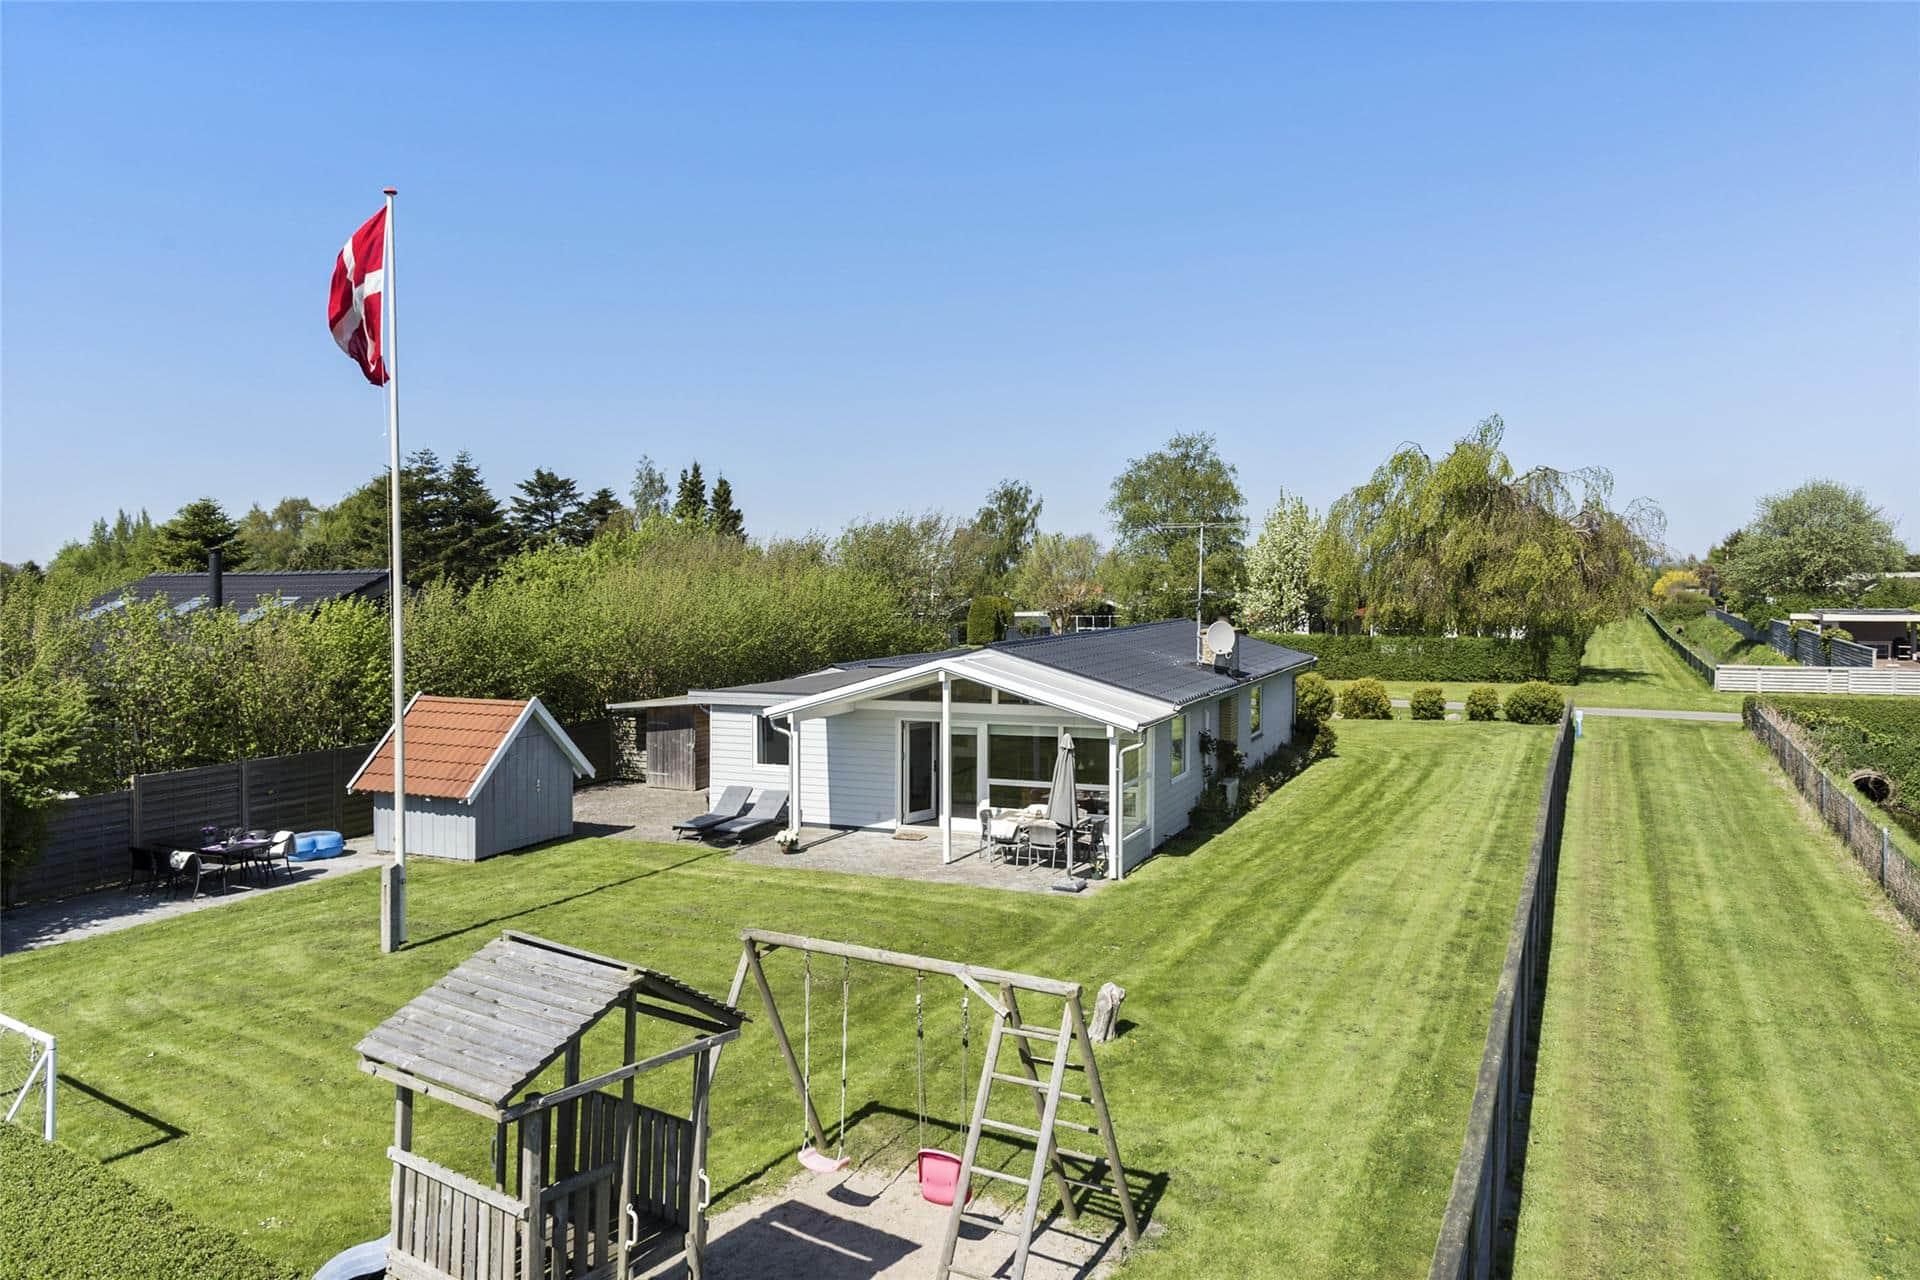 Bild 1-3 Ferienhaus M64525, Sitkavænget 22, DK - 5450 Otterup